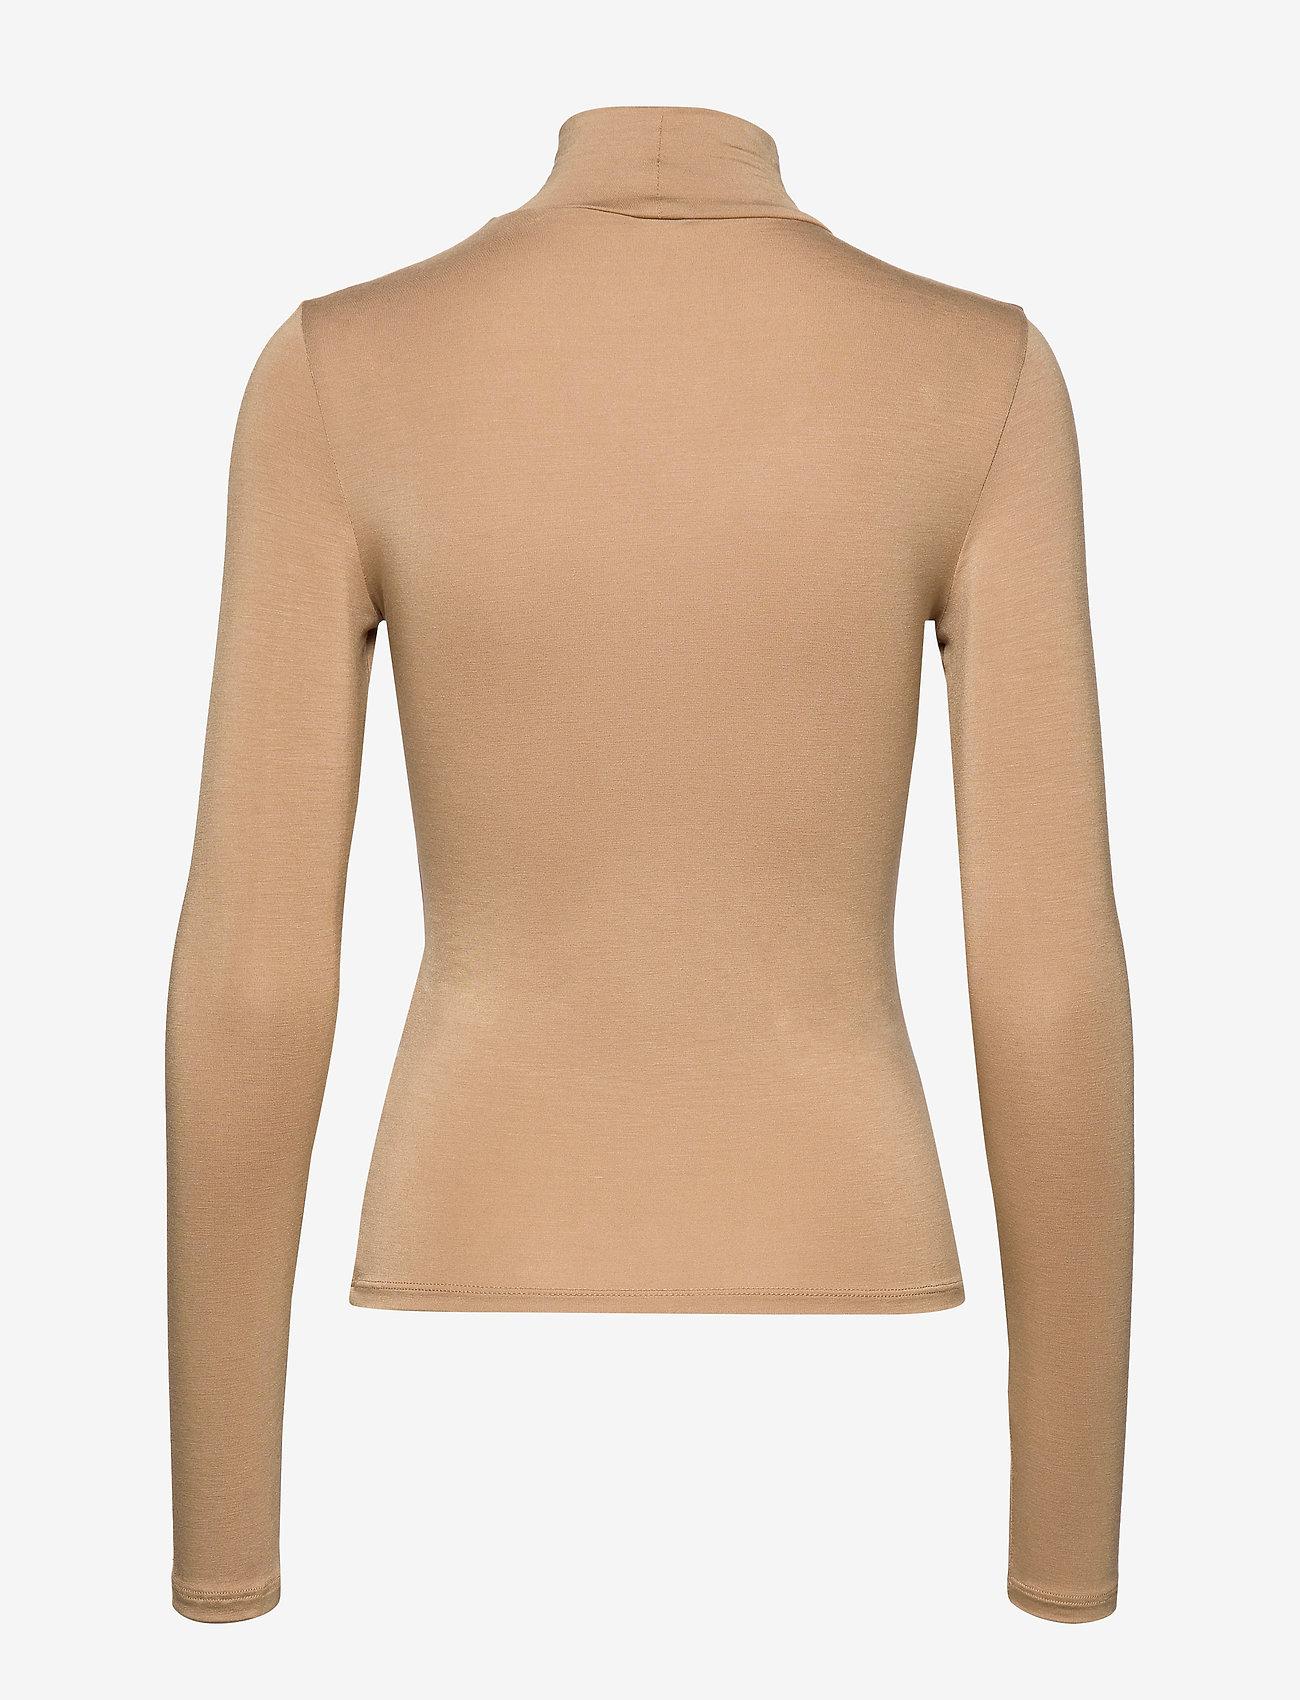 Gina Tricot Dora Turtleneck - T-shirts & Tops